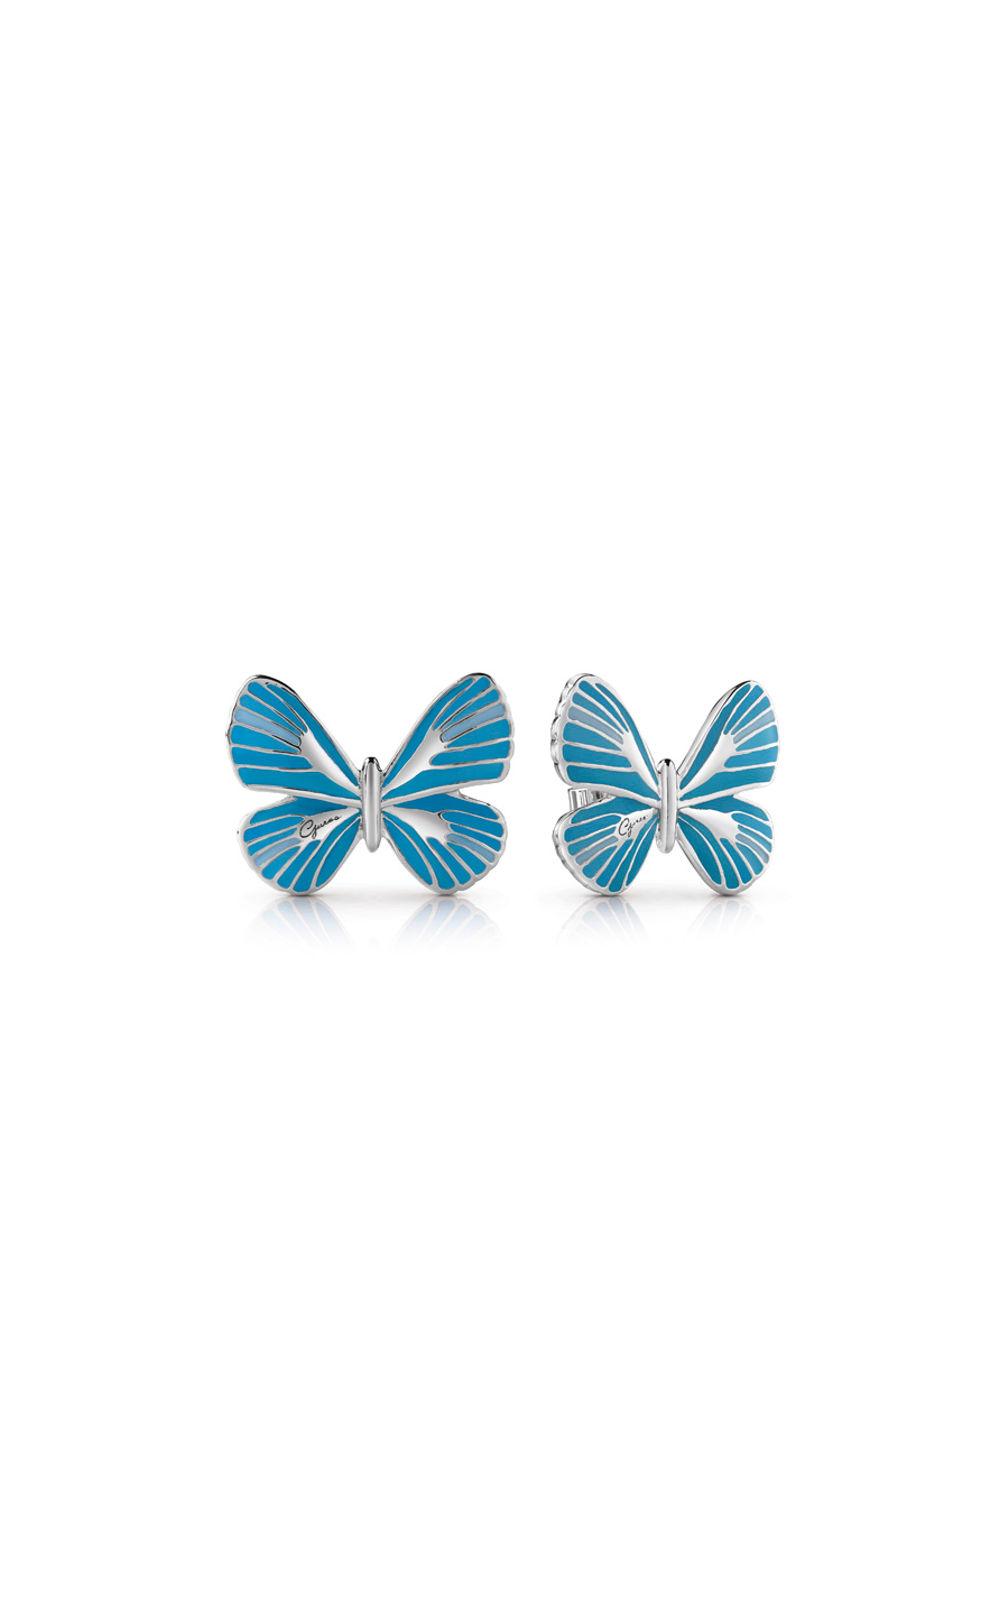 GUESS FAUX UBE85088 Ασημένια Σκουλαρίκια Με Μπλε Πεταλούδα